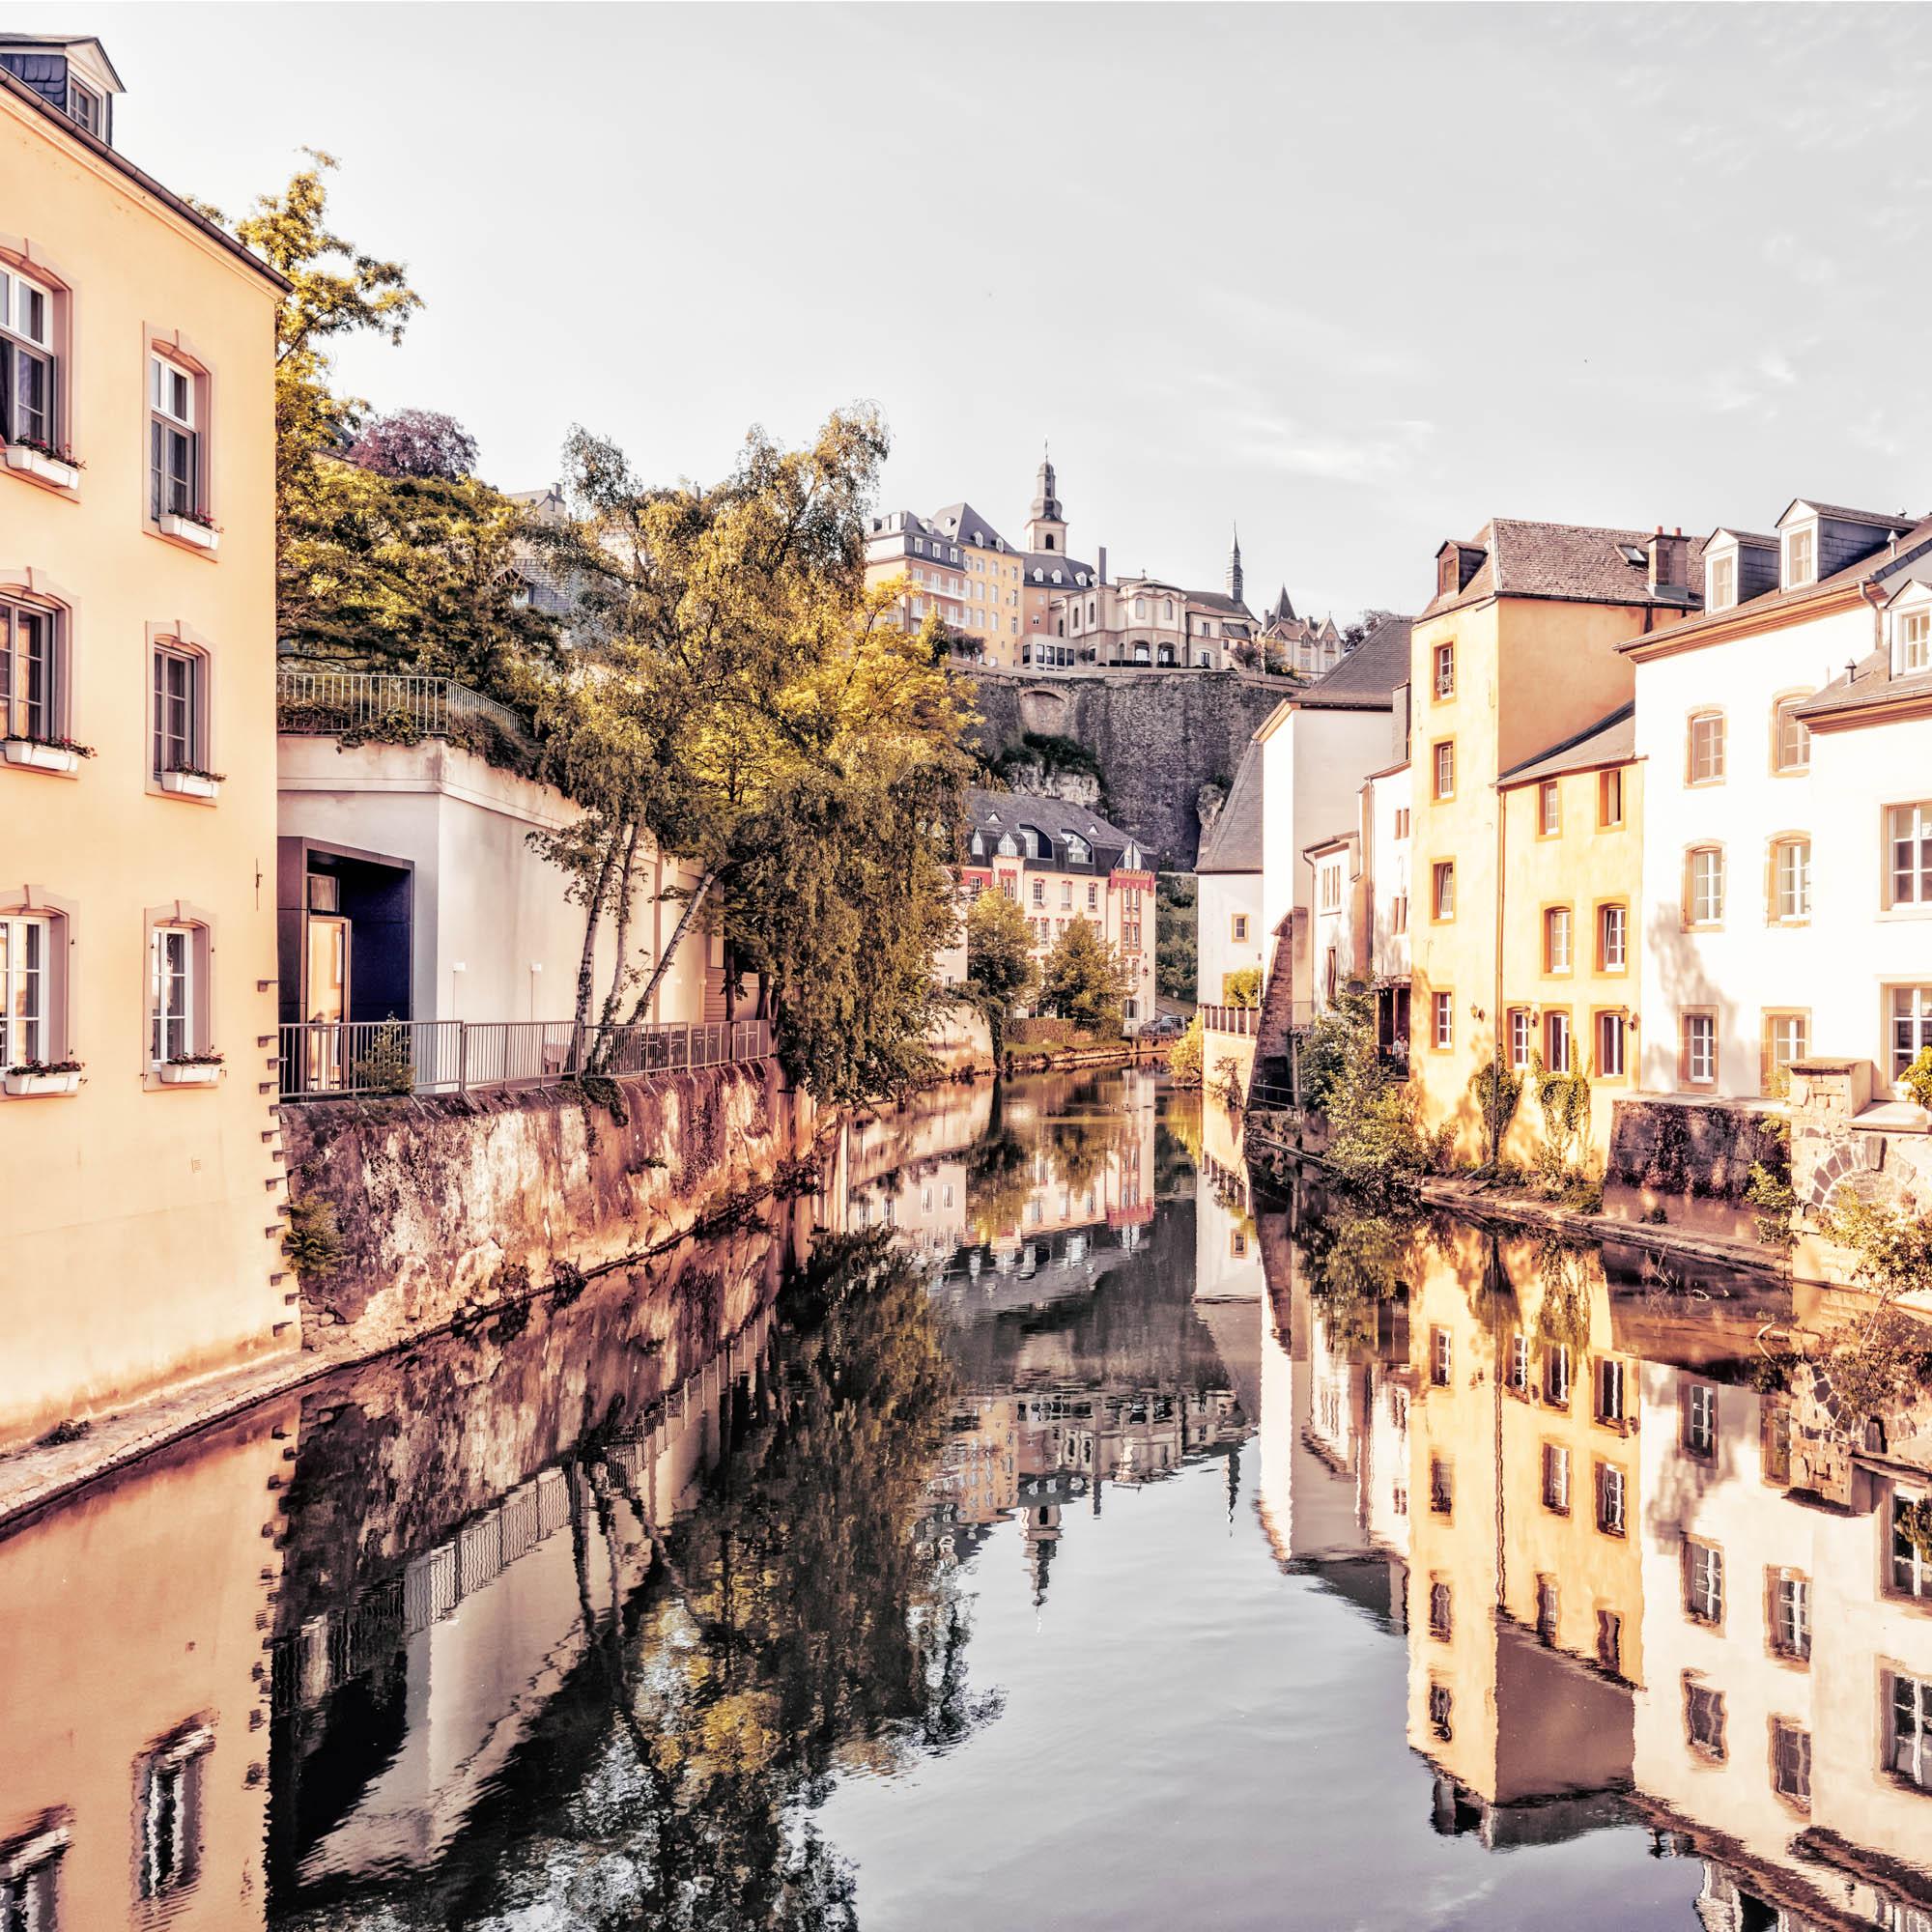 LUXEMBOURG-Still-11.jpg